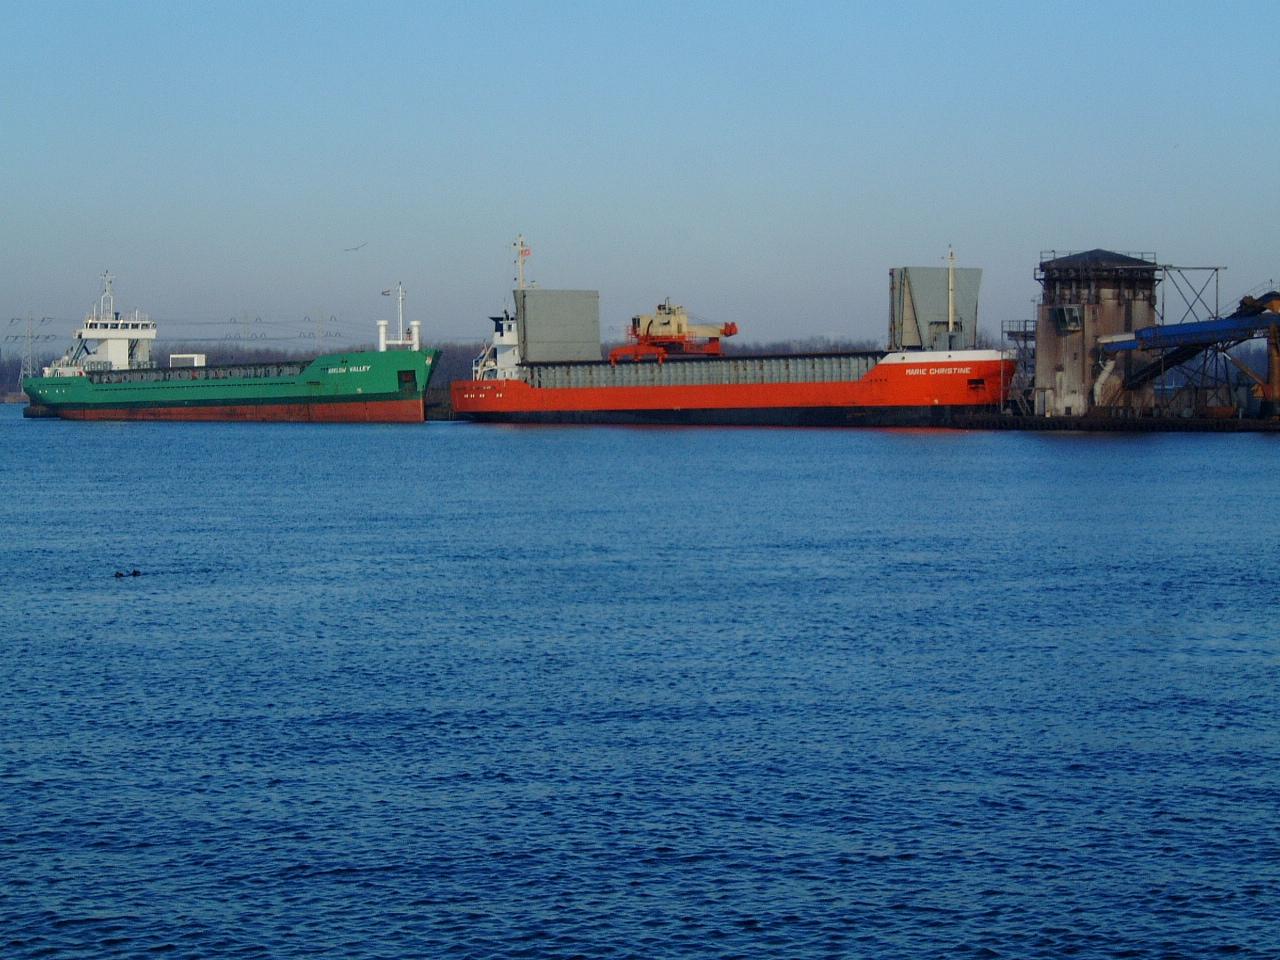 maartent ships in a harbour water